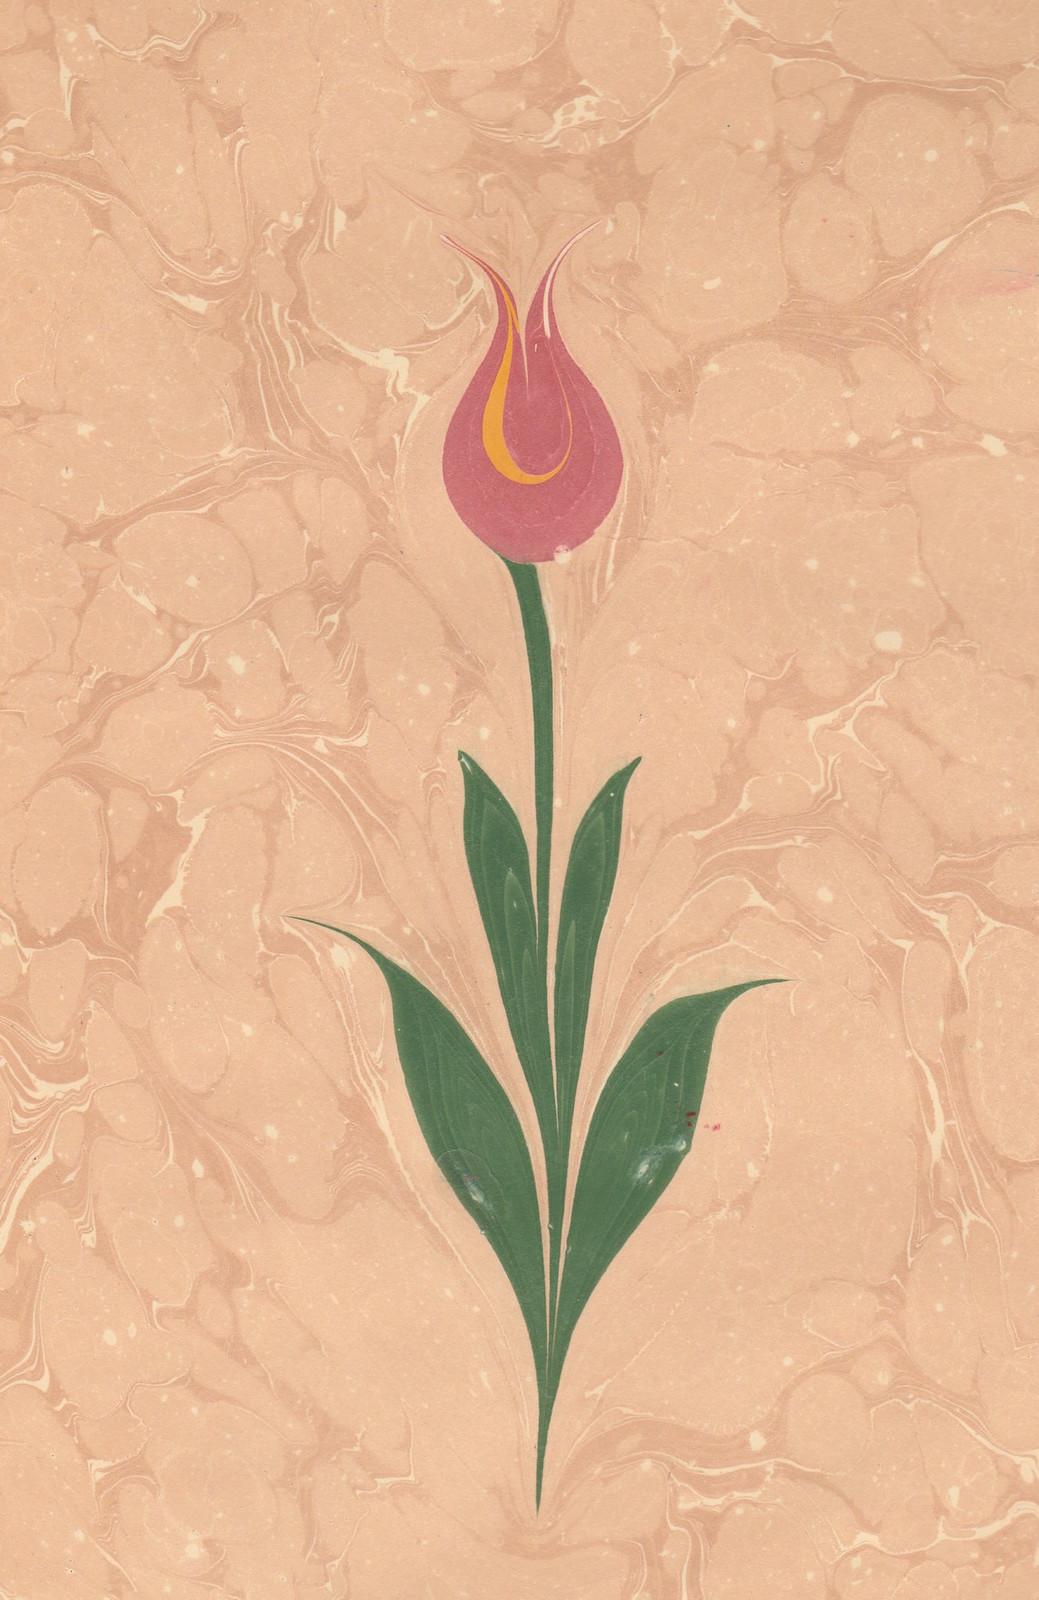 ebru lale 於伊斯坦堡繪製的浮水畫作品